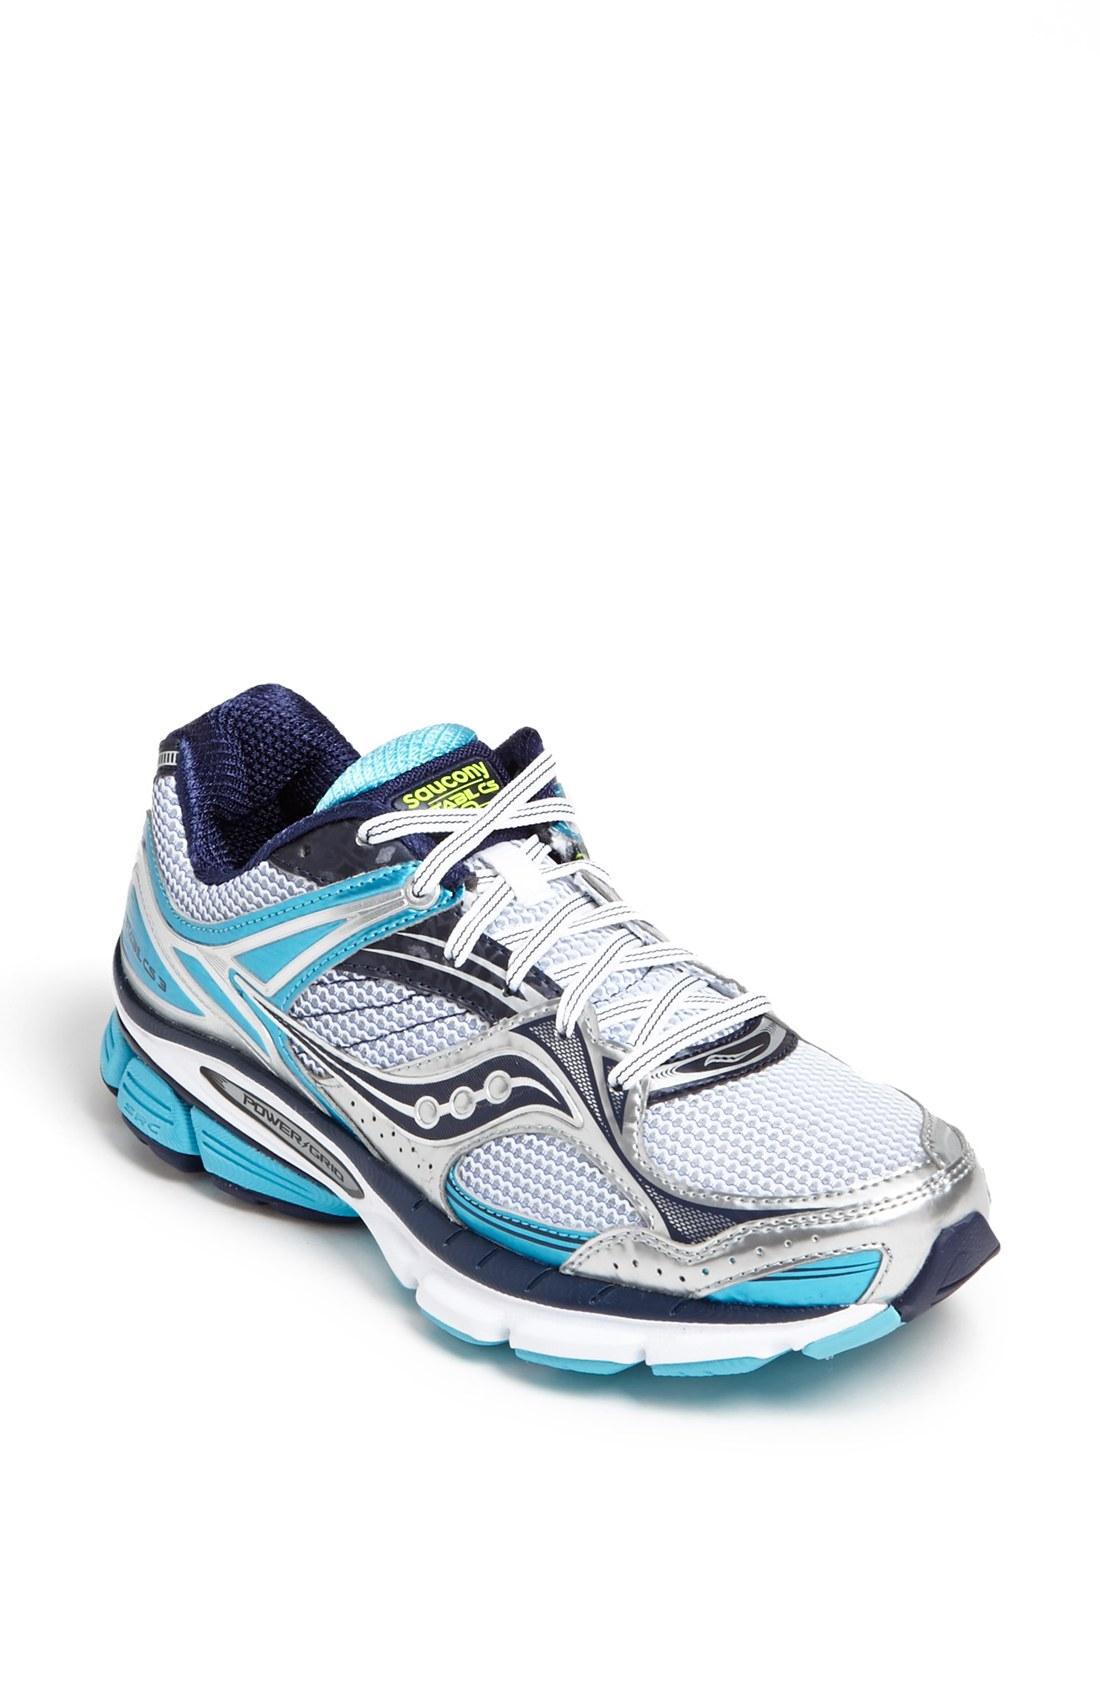 saucony stabil cs3 running shoe in white white blue. Black Bedroom Furniture Sets. Home Design Ideas